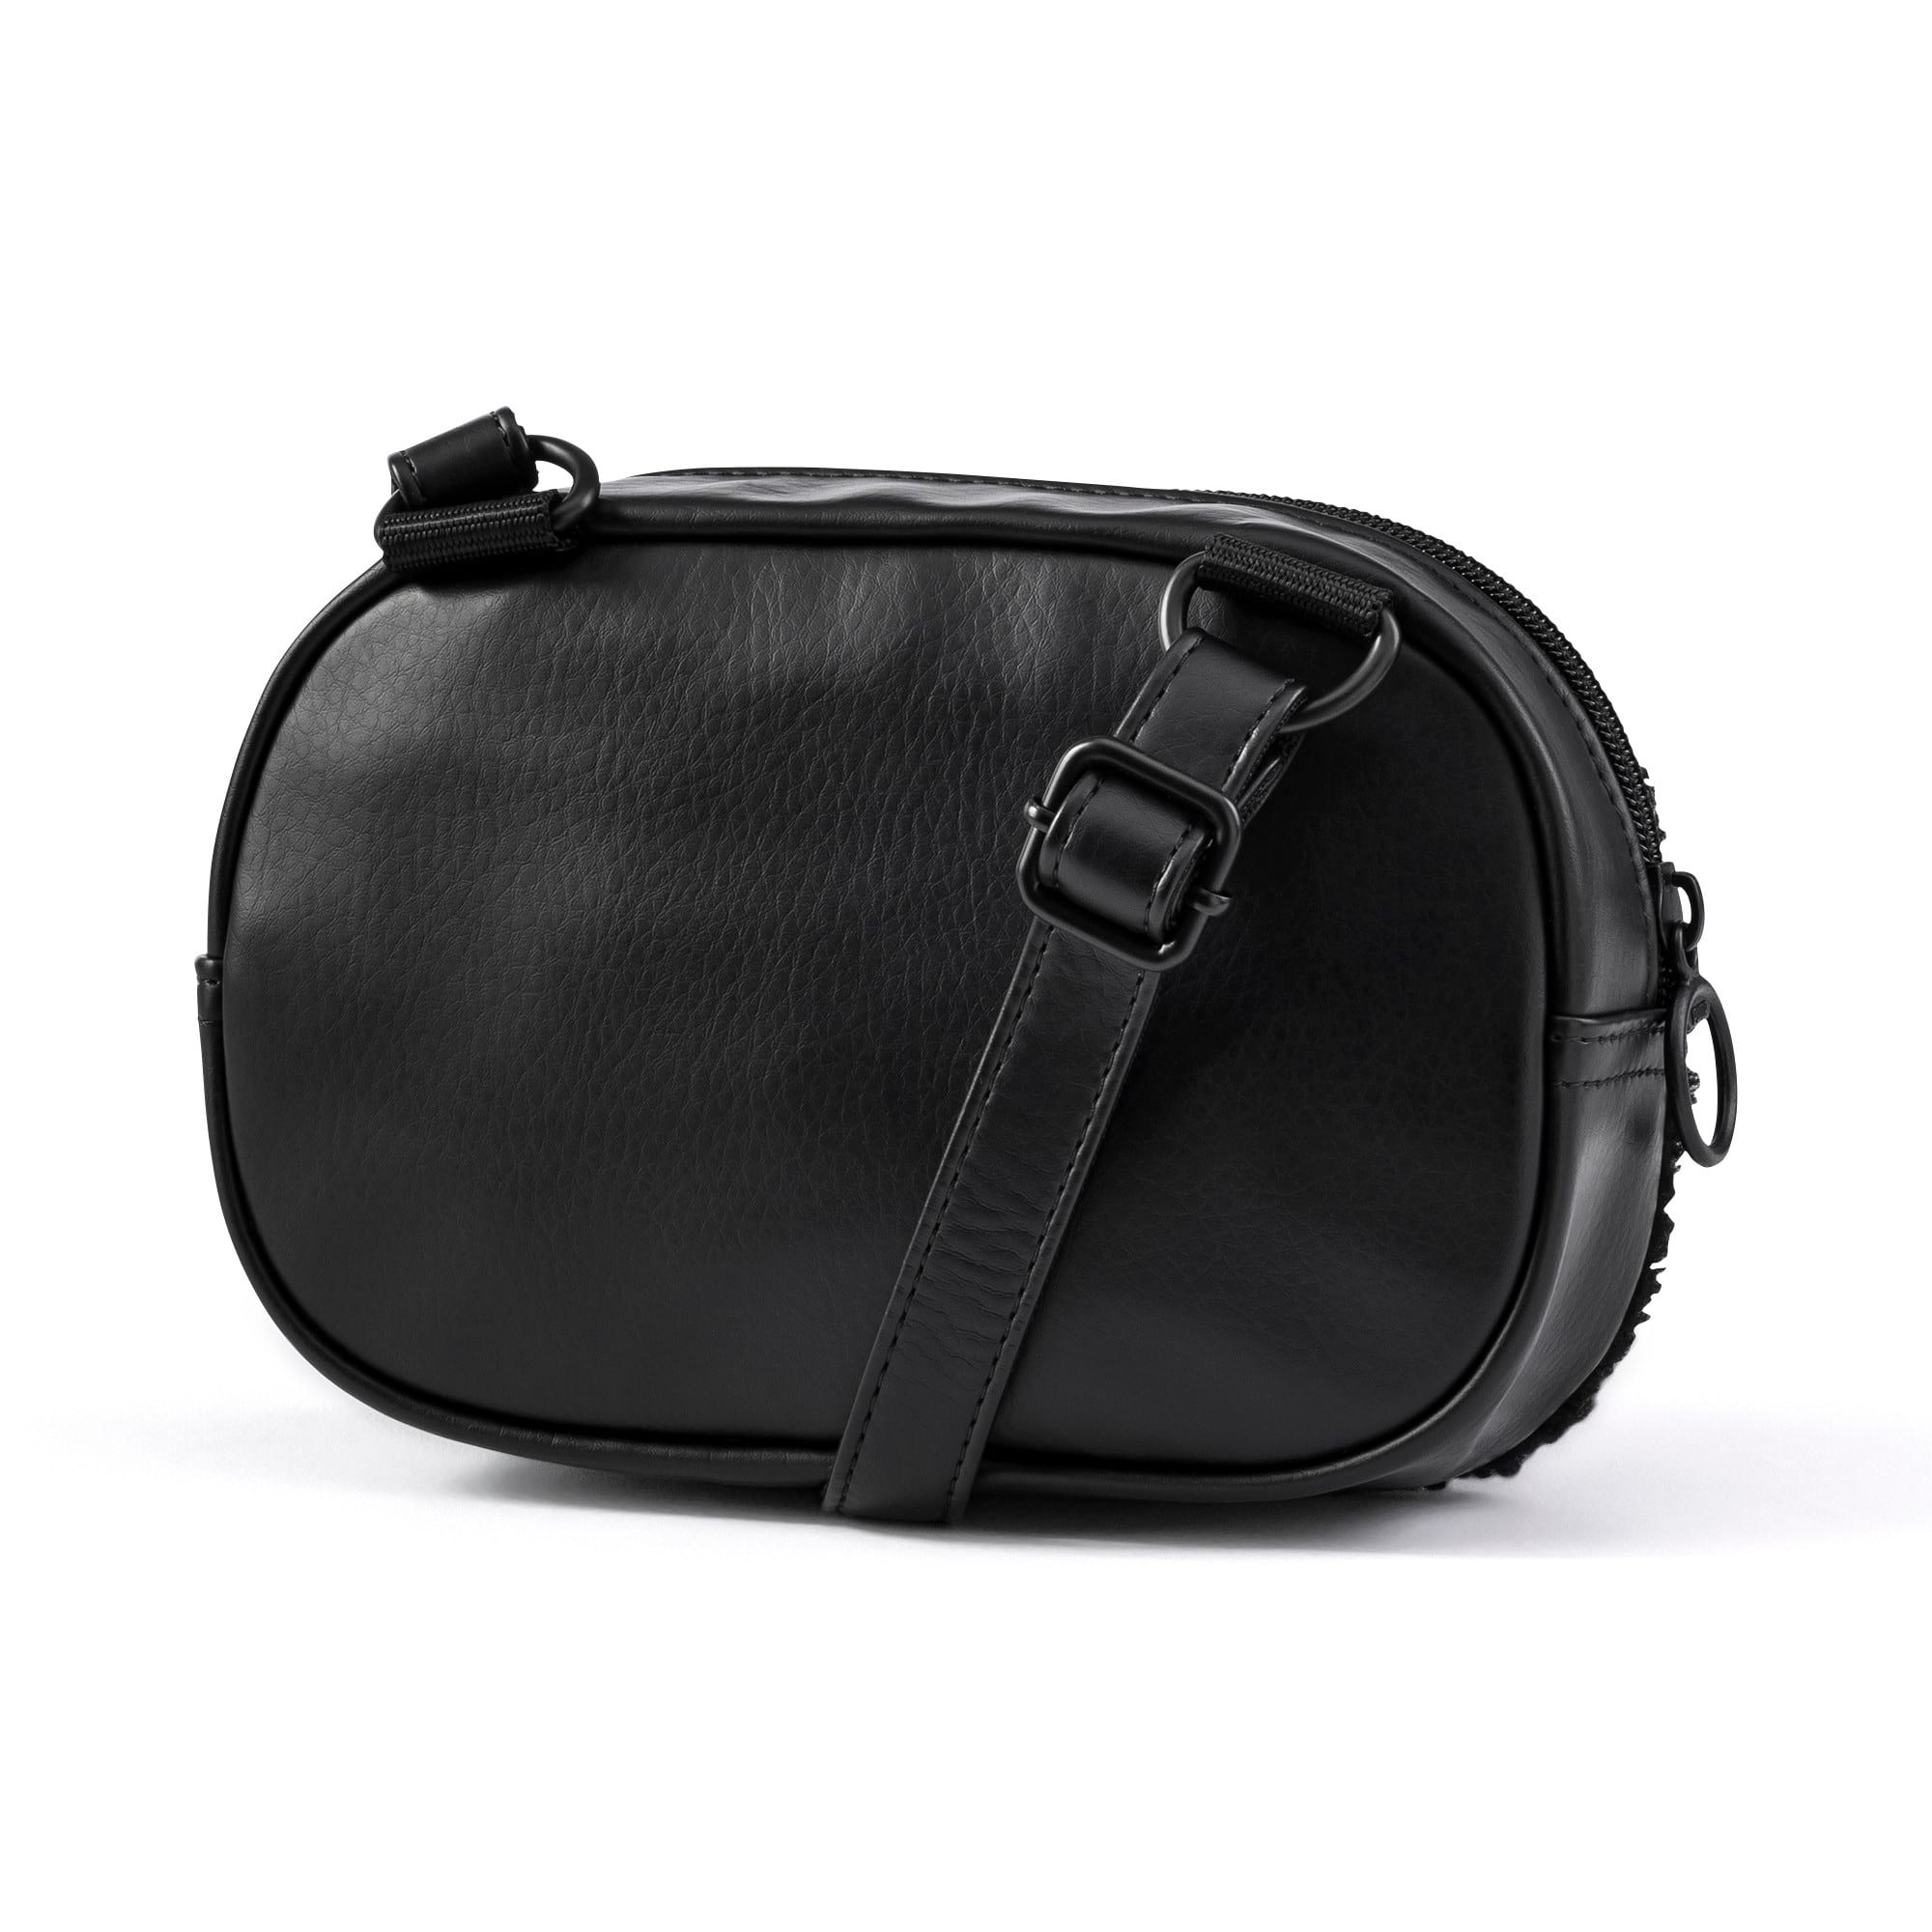 Thumbnail 3 of Prime Time Women's X-Body Bag, Puma Black-Puma Black, medium-IND